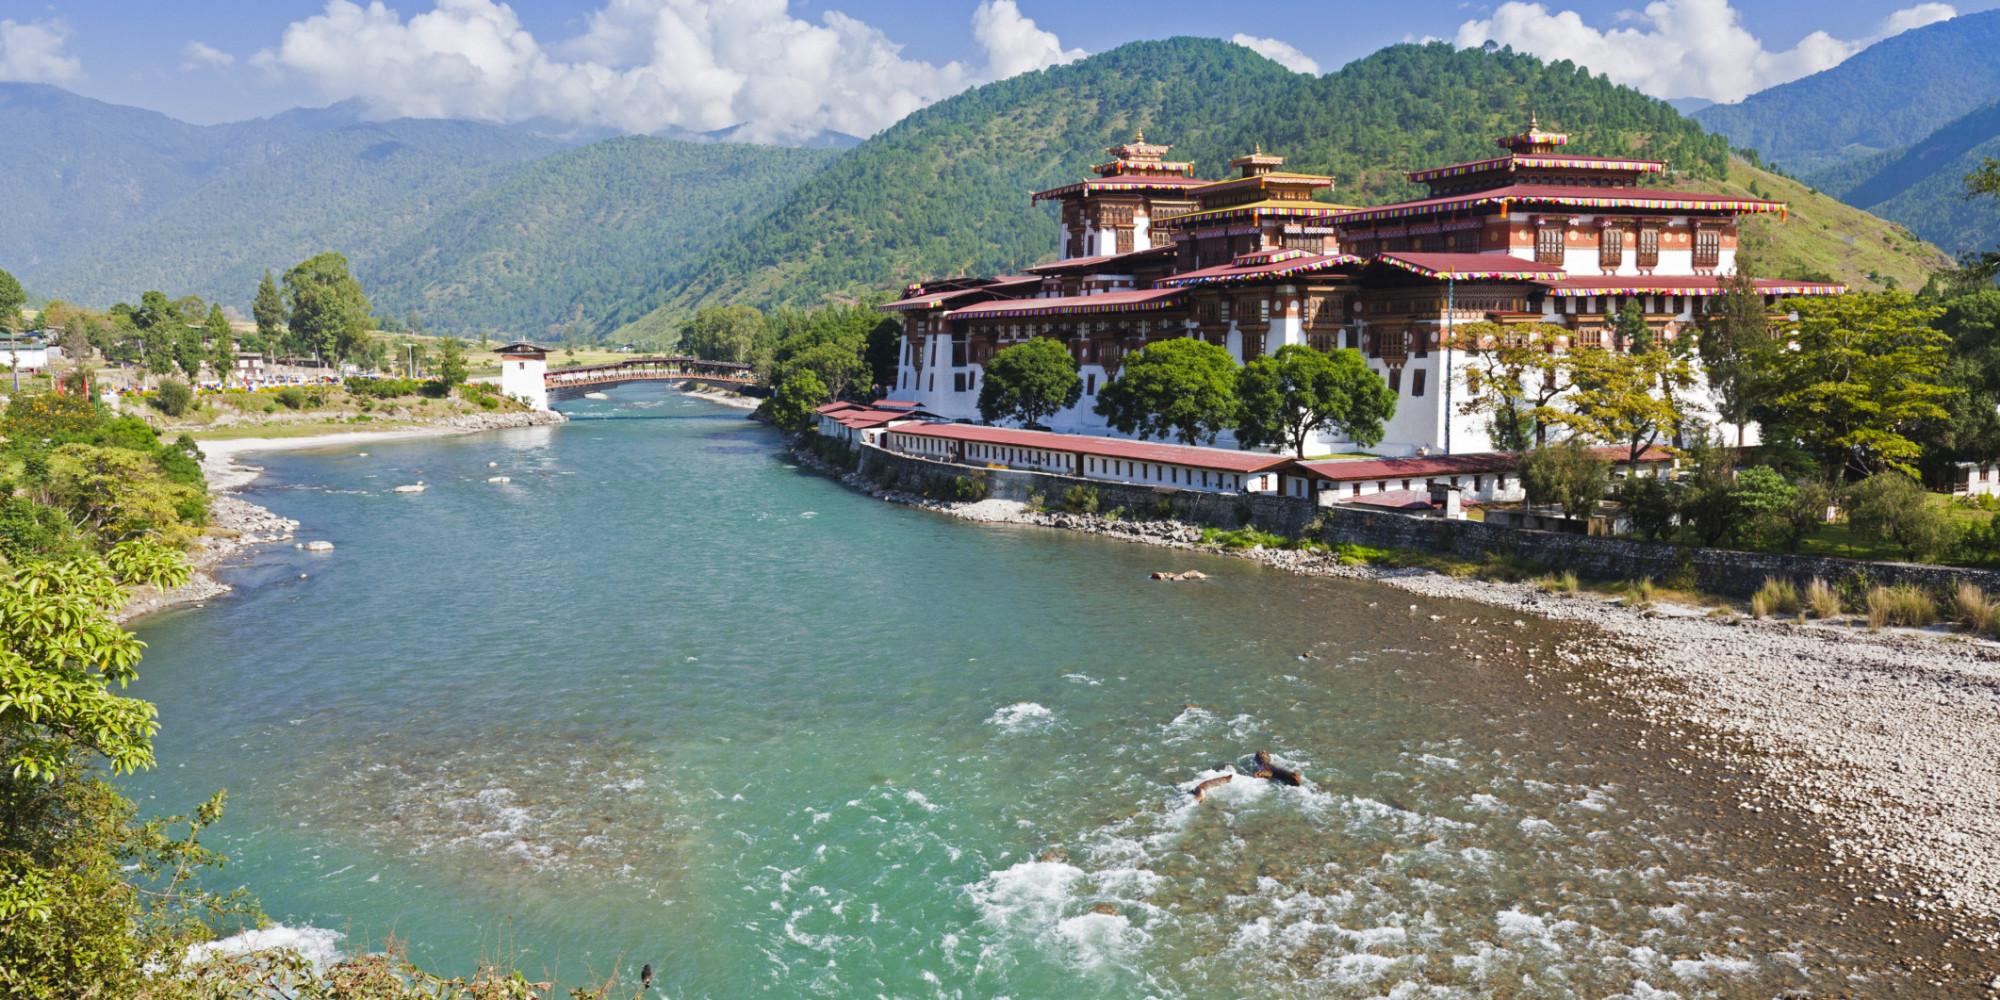 Behold the Beauty of Bhutan | The Huffington Post: http://www.huffingtonpost.com/emily-odell/behold-the-beauty-of-bhut_b_8608518.html